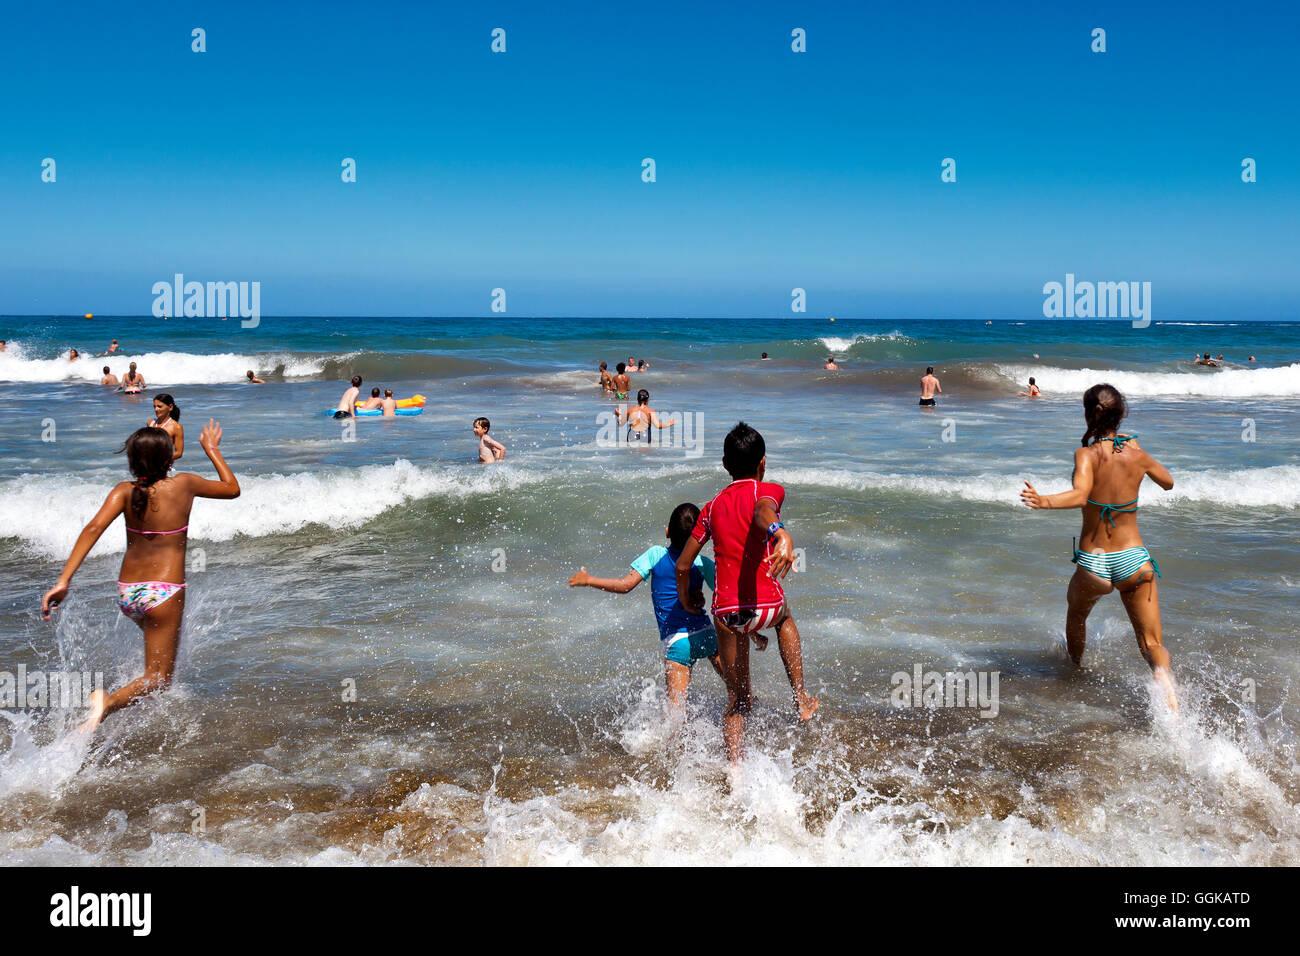 Kinder laufen ins Meer, Playa del Ingles, Gran Canaria, Kanarische Inseln, Spanien Stockbild